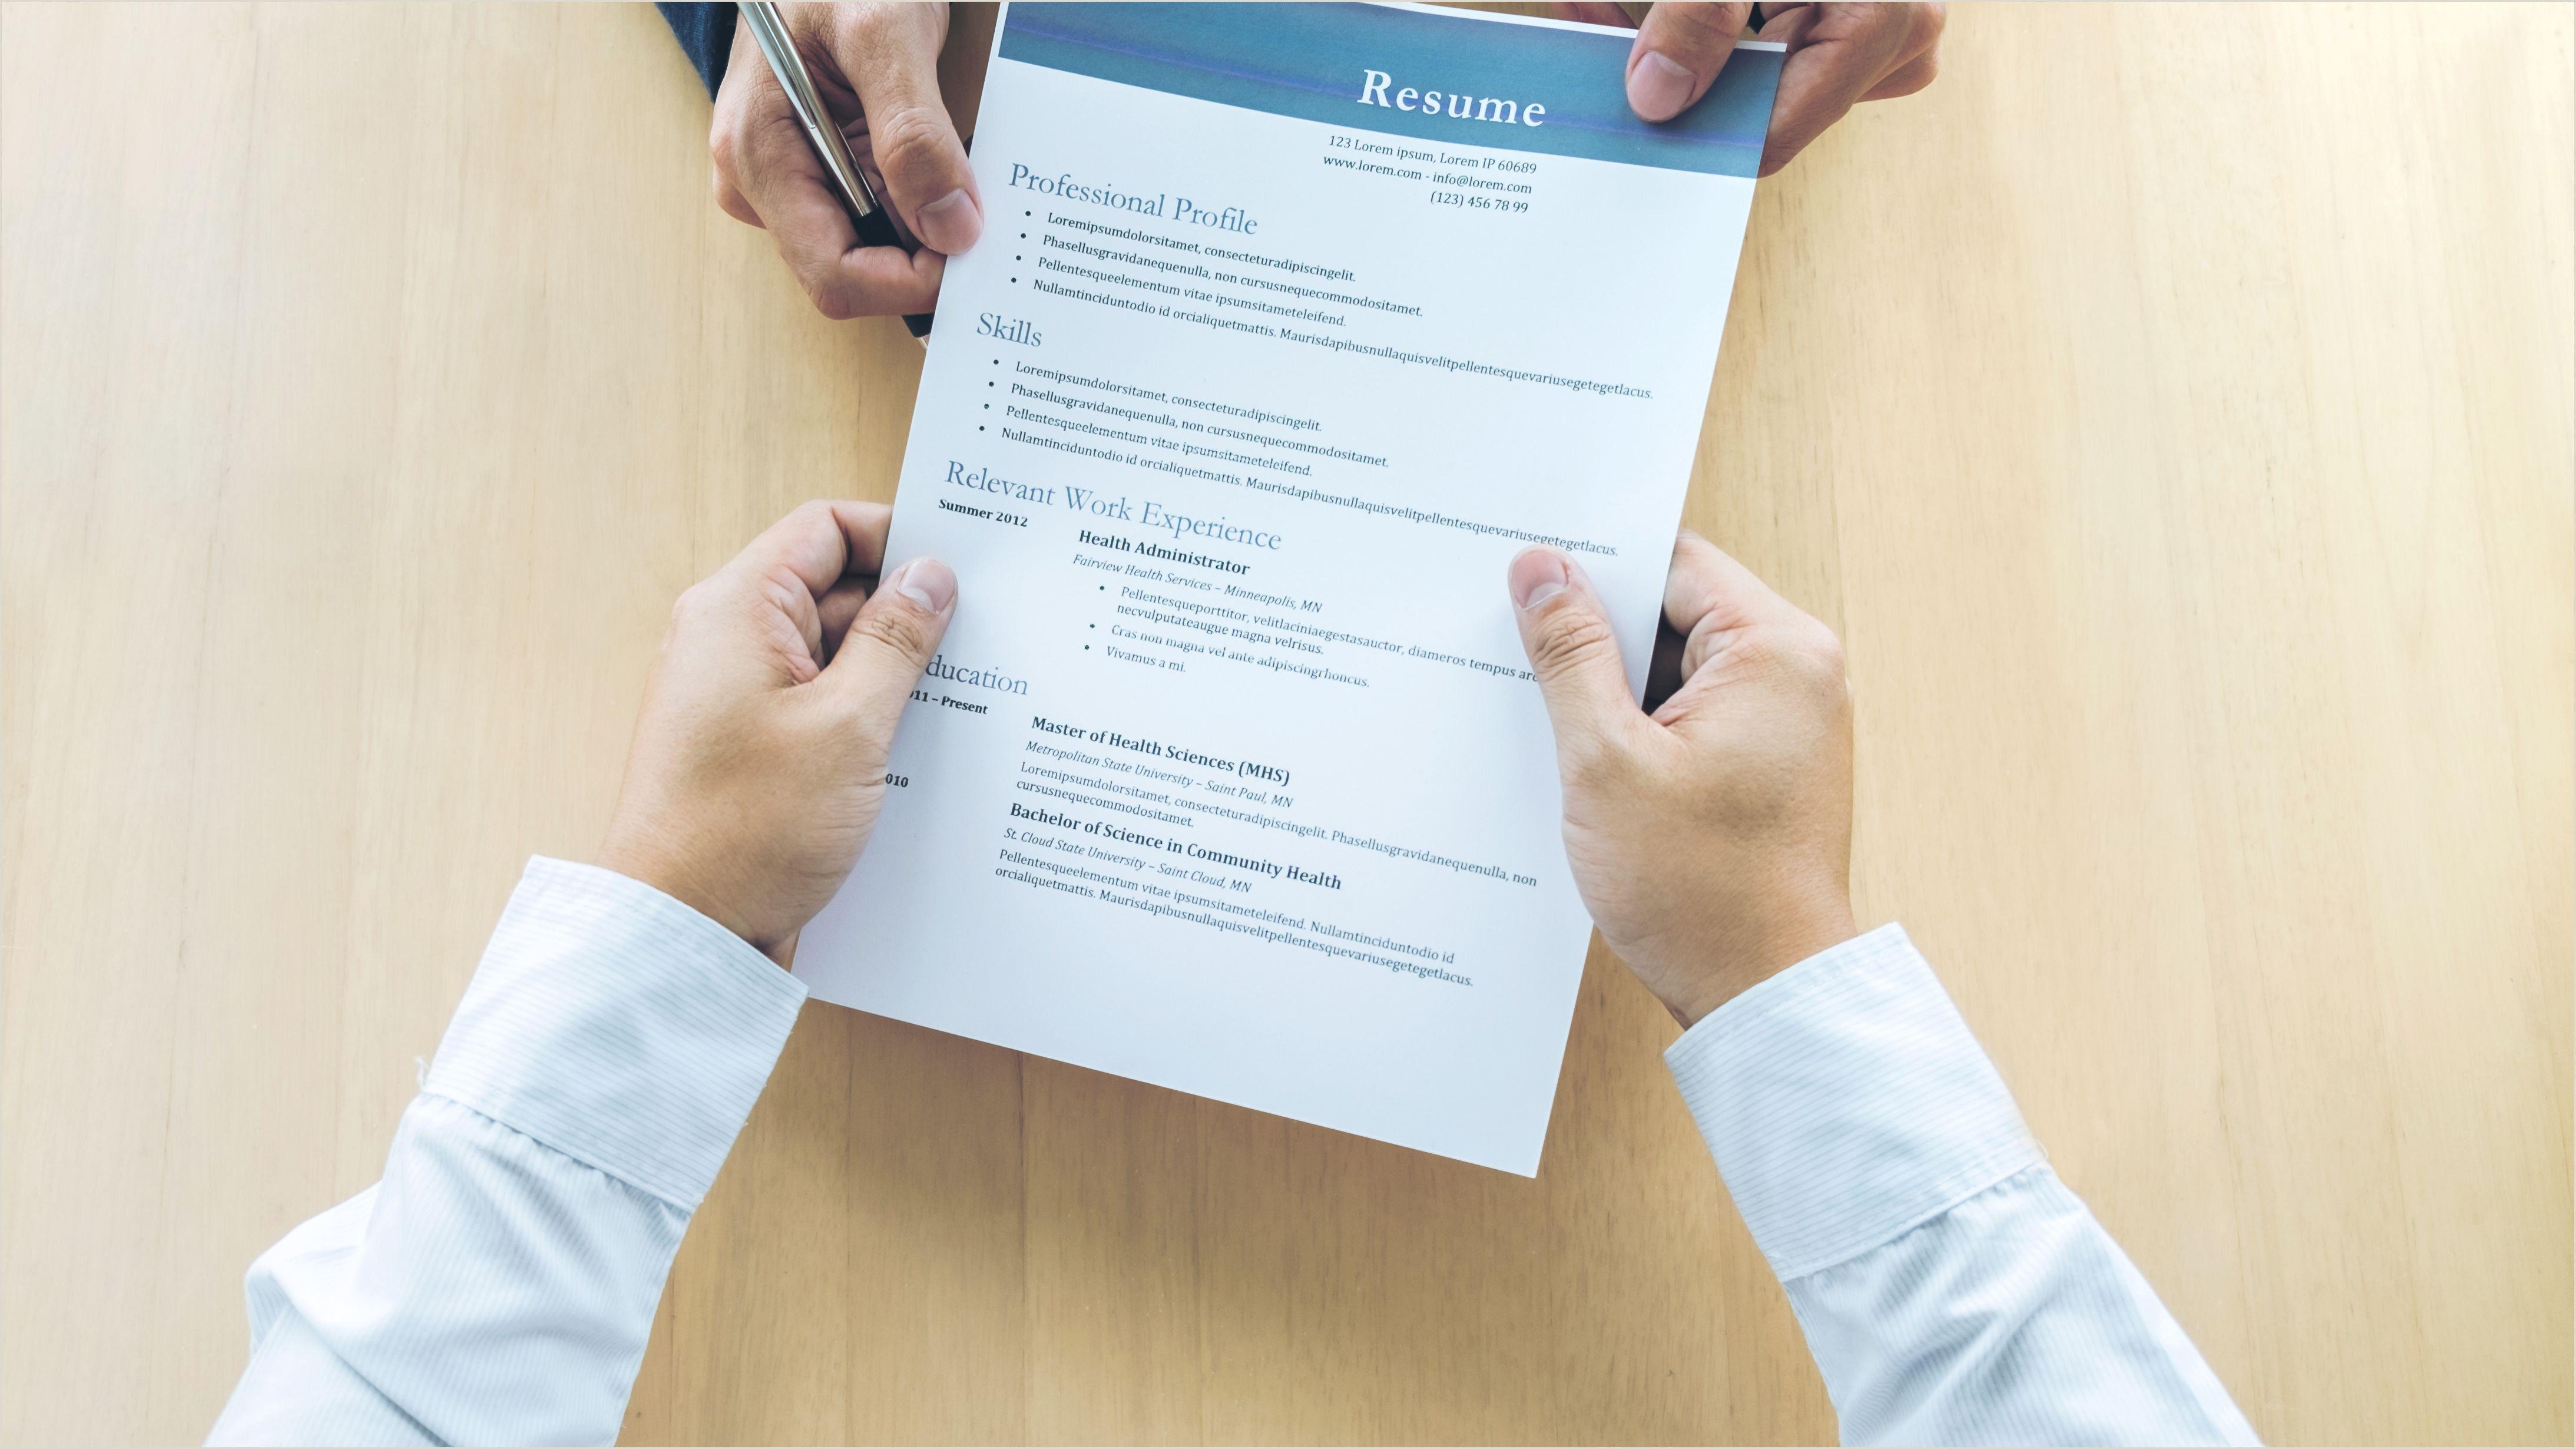 Contoh Cv Format Europass Resume Skills Section Resume Skills Job Resume Examples